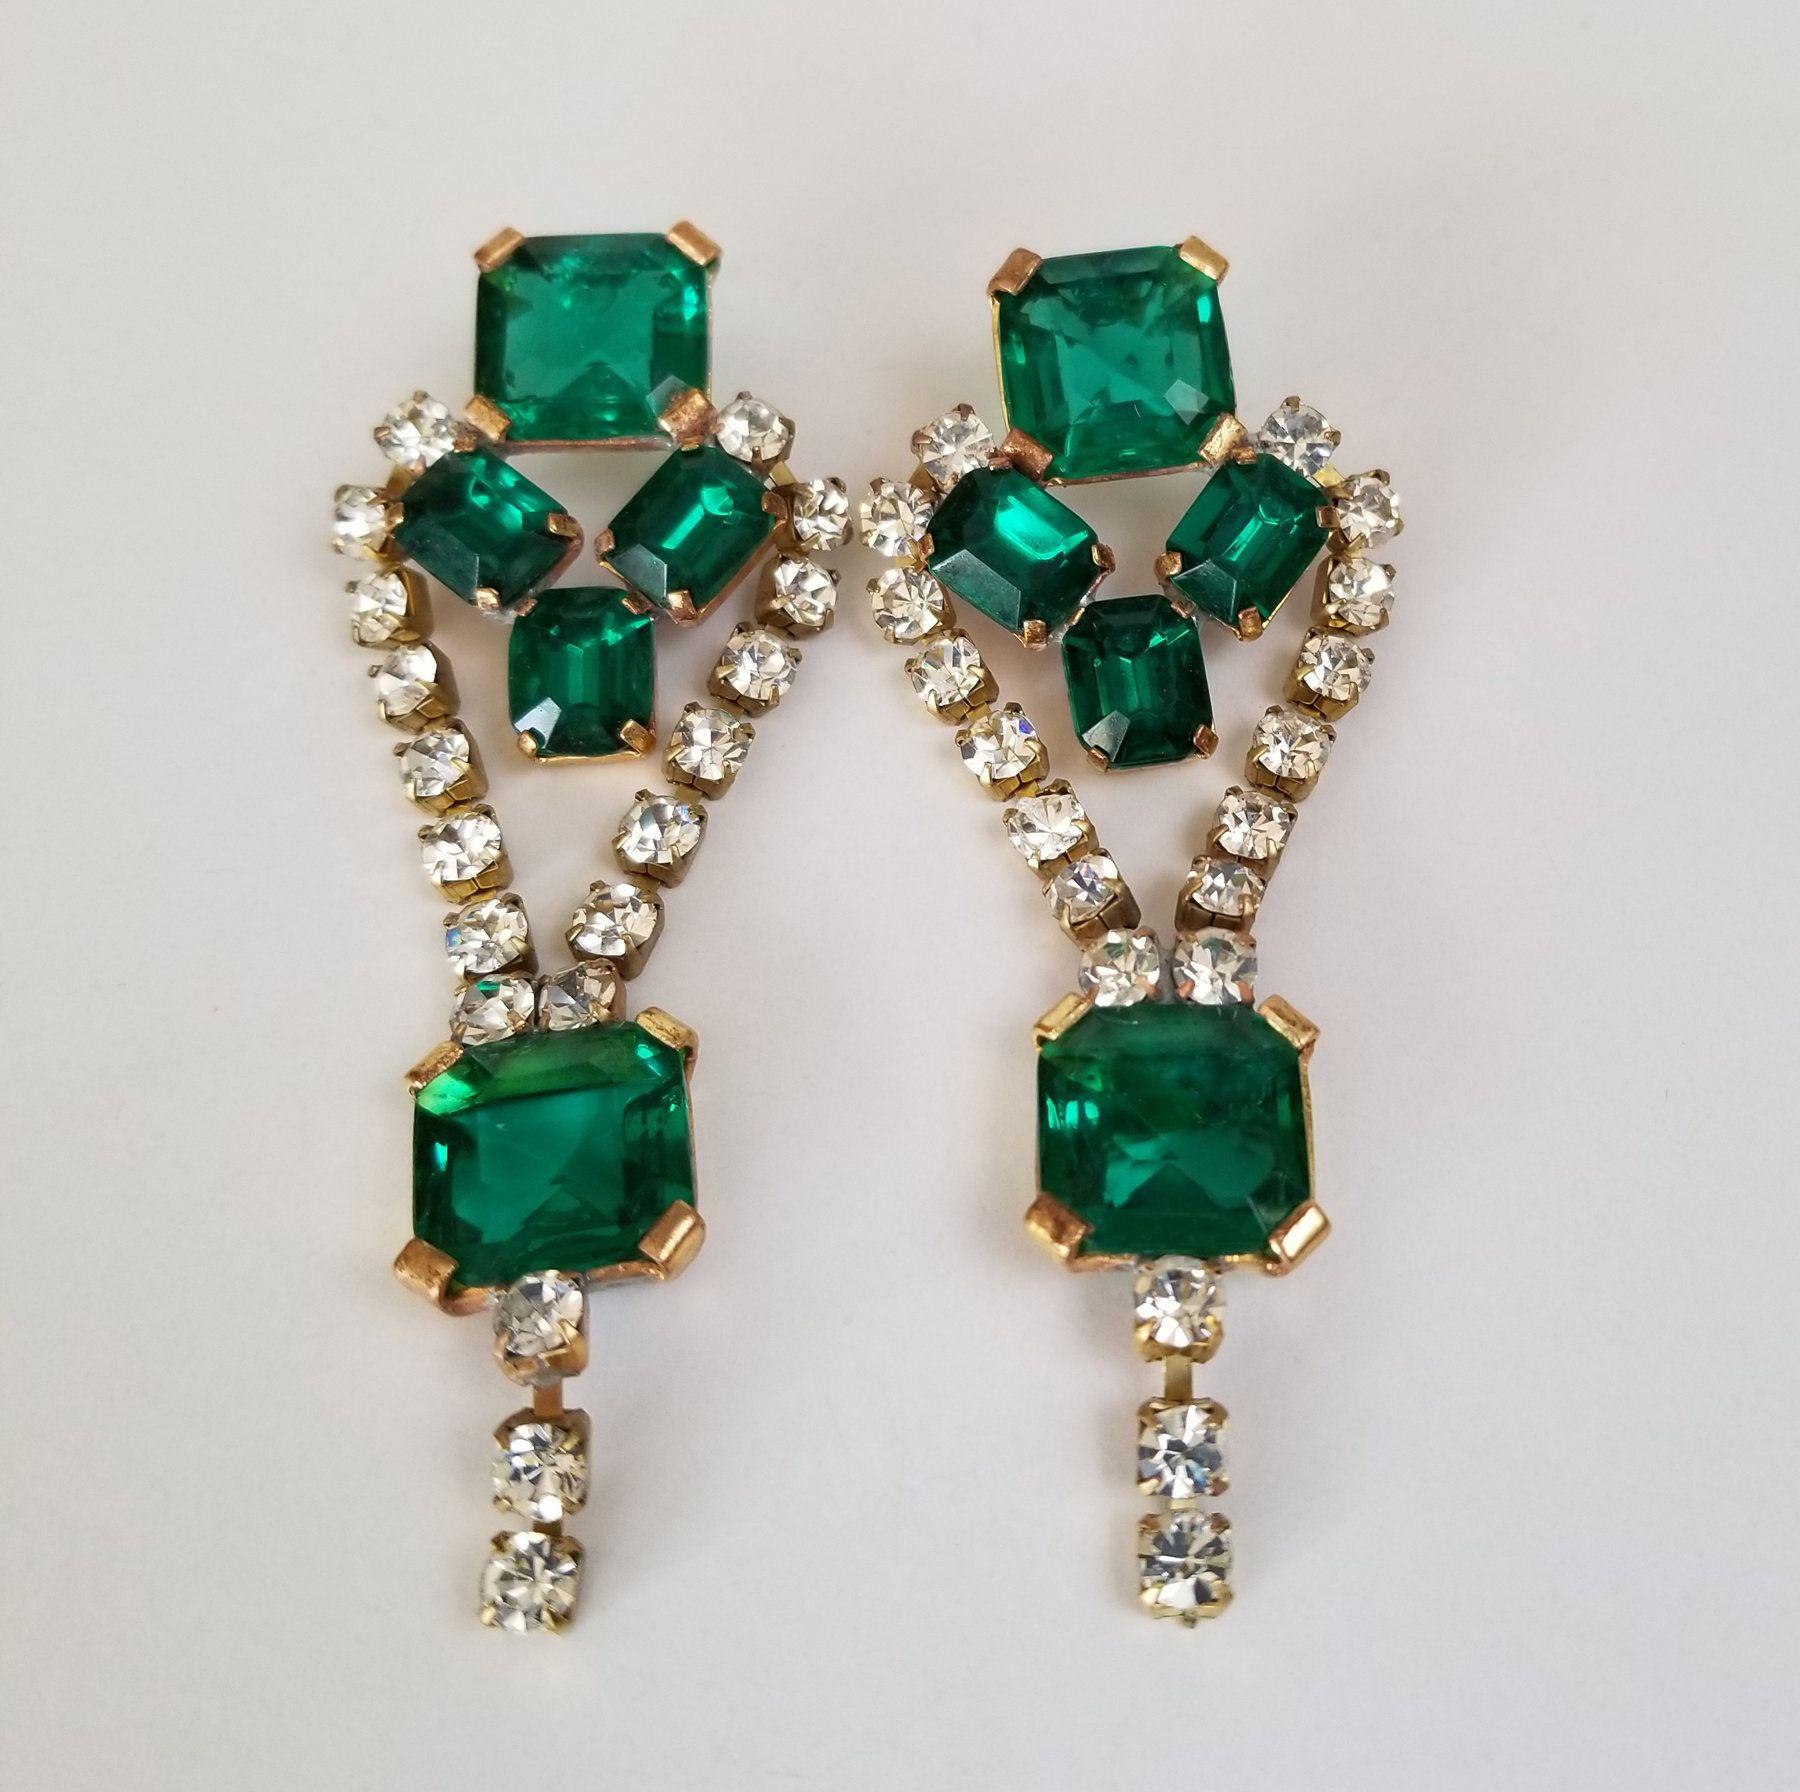 Vintage Rhinestone Dangling Pierced Earrings